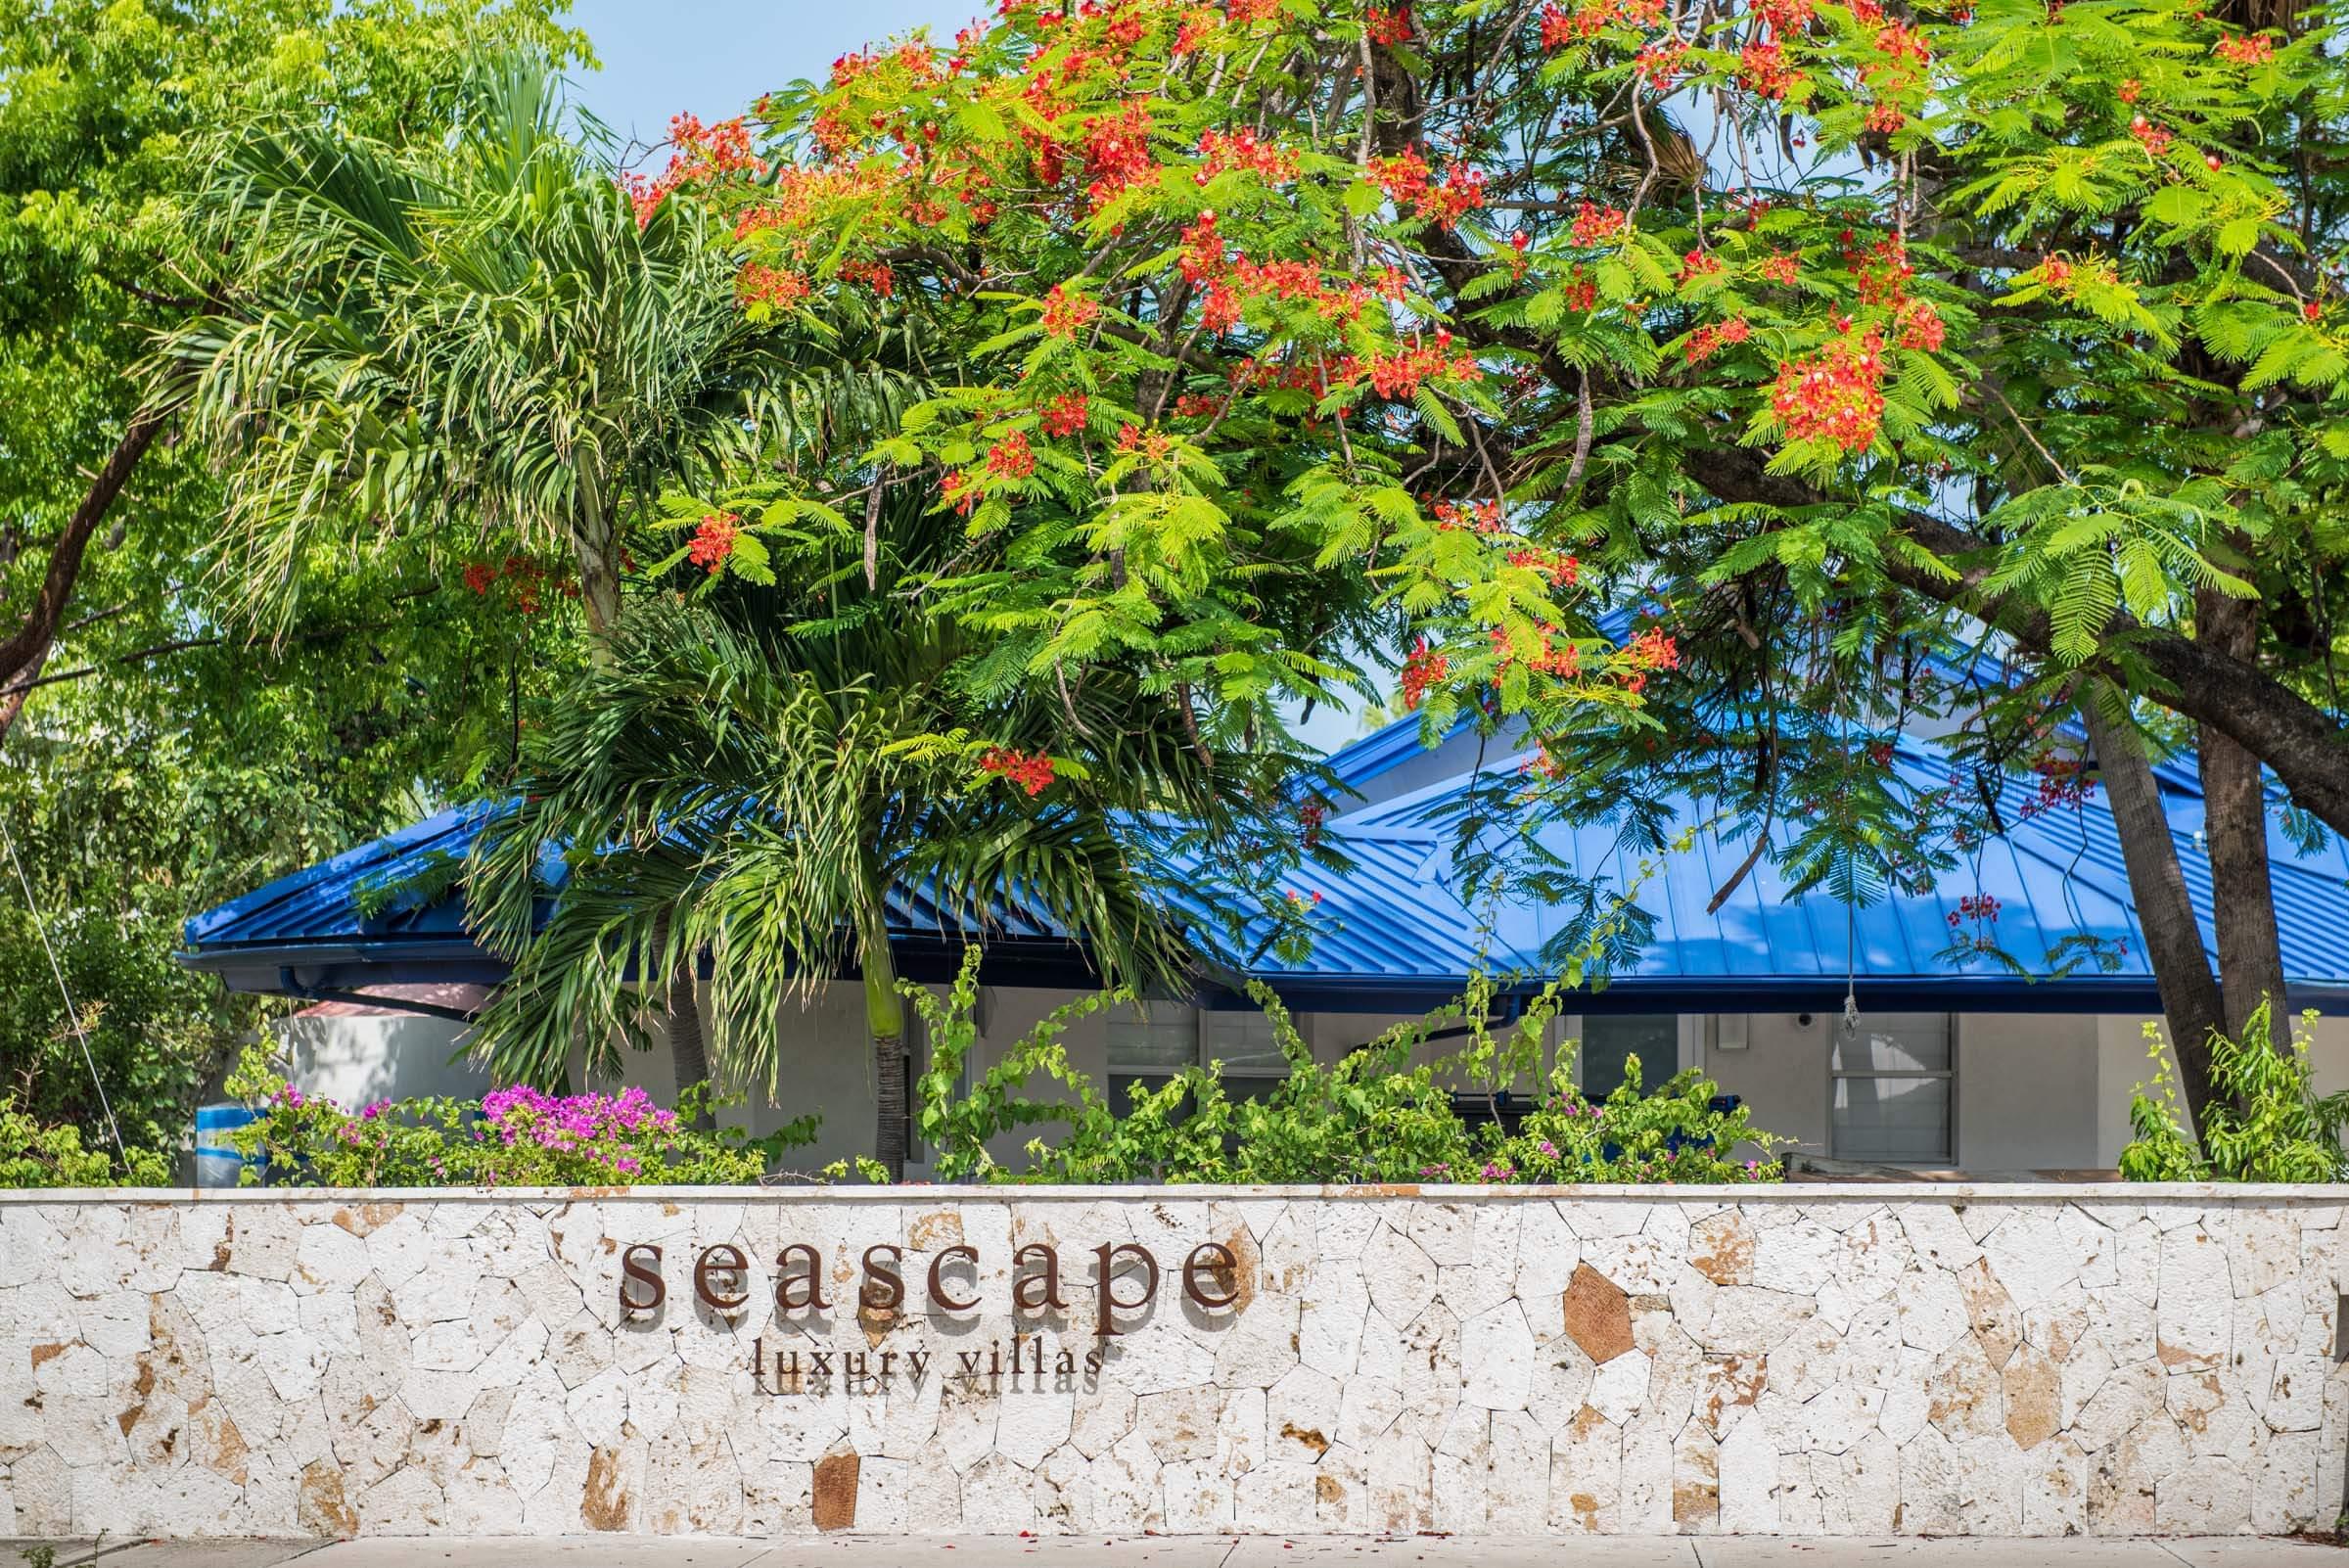 Seascape Villa Entrance Cayman Islands Caribbean Vacation Beach Home